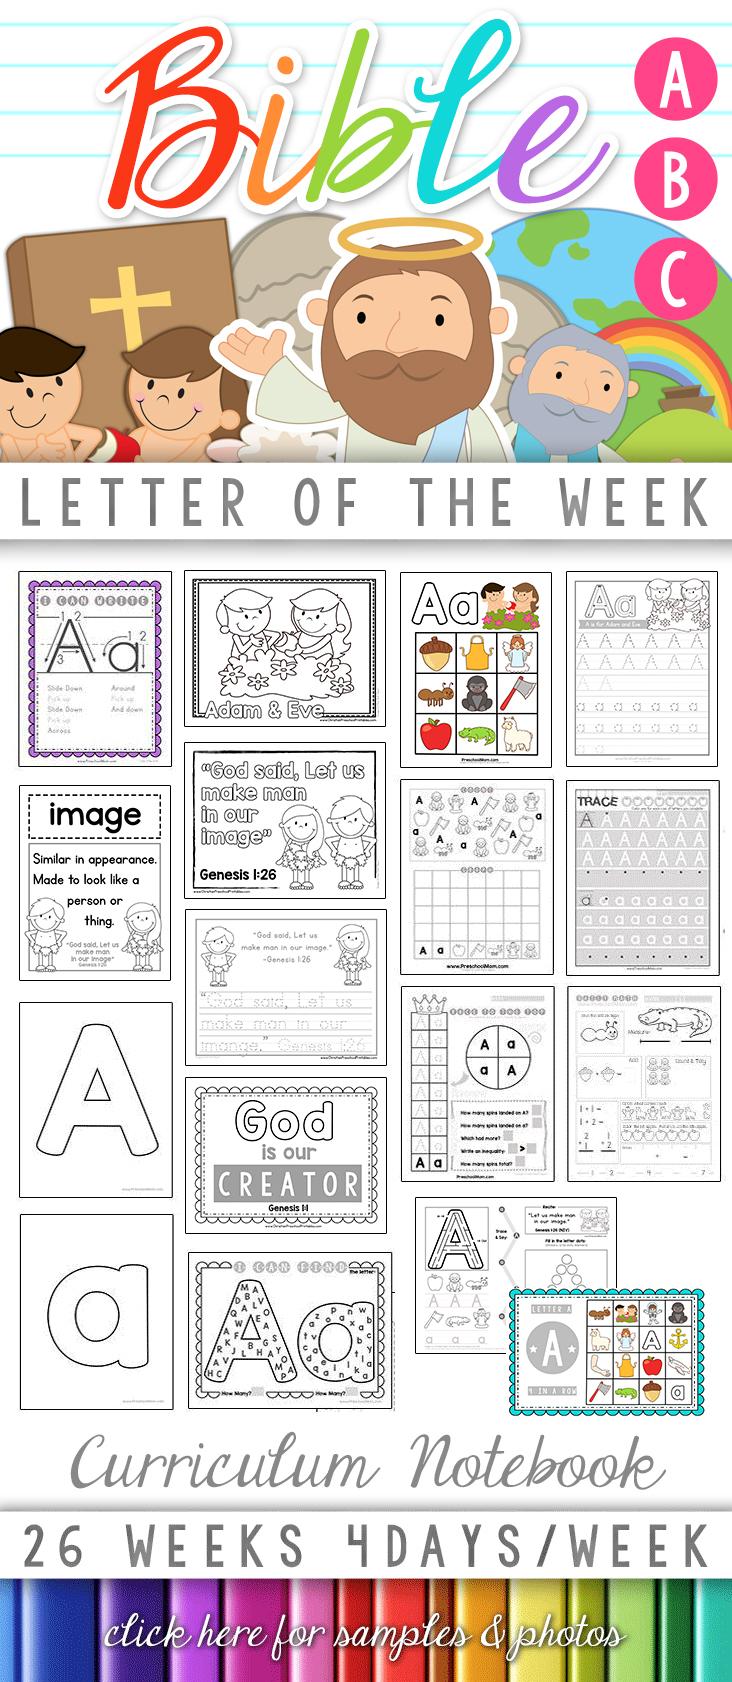 Bible Abc Printables - Christian Preschool Printables - Printable Bible Puzzles For Preschoolers